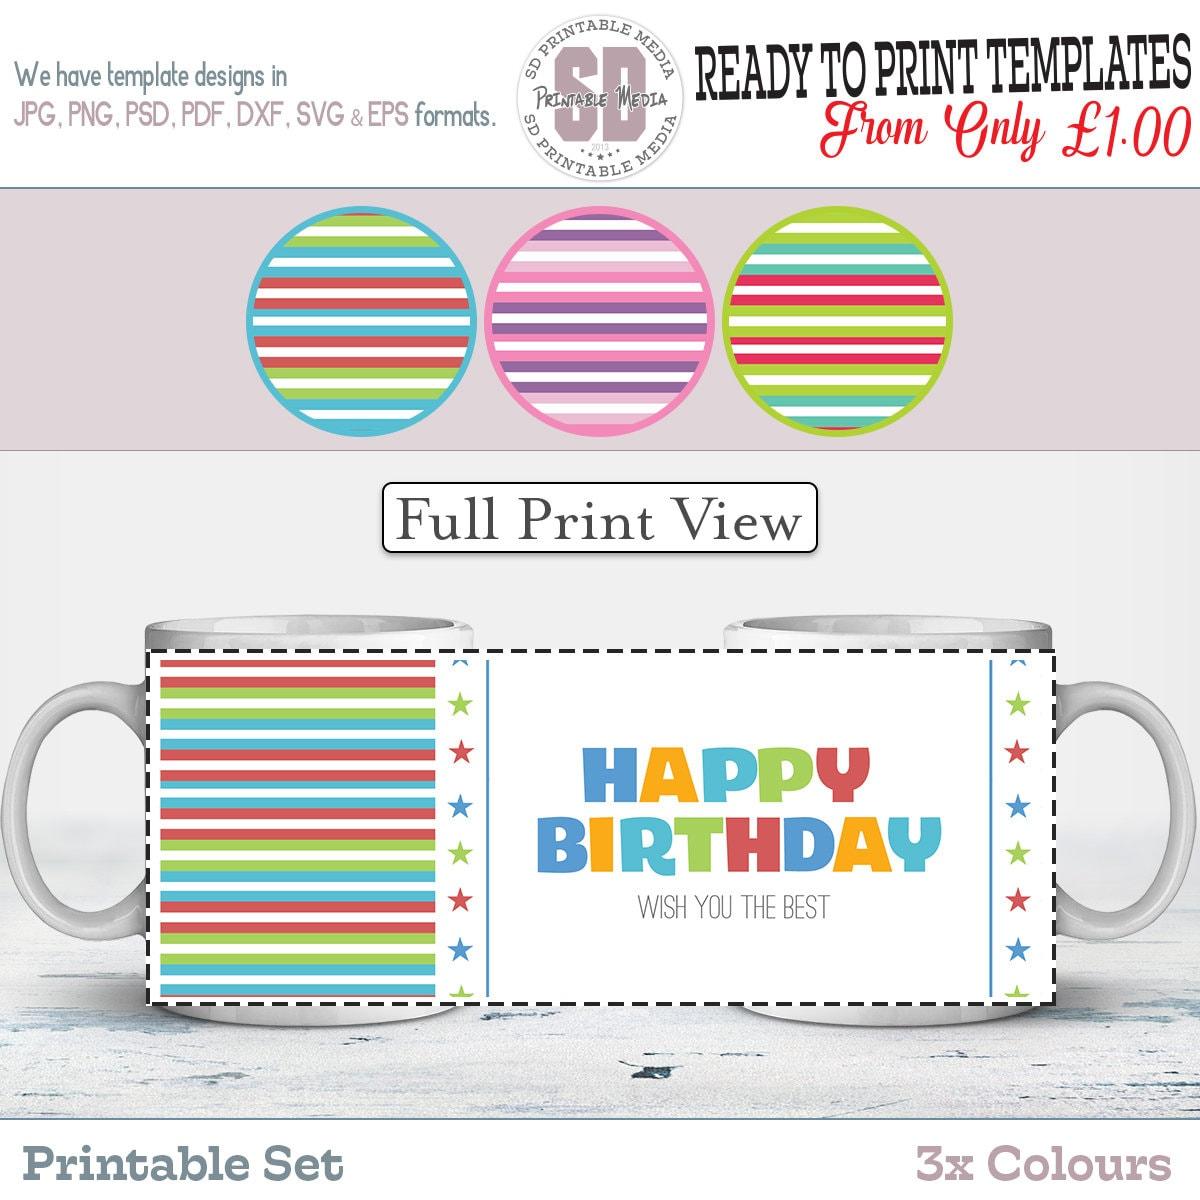 Birthday Sublimation Mug Design Birthday Mug Design Template